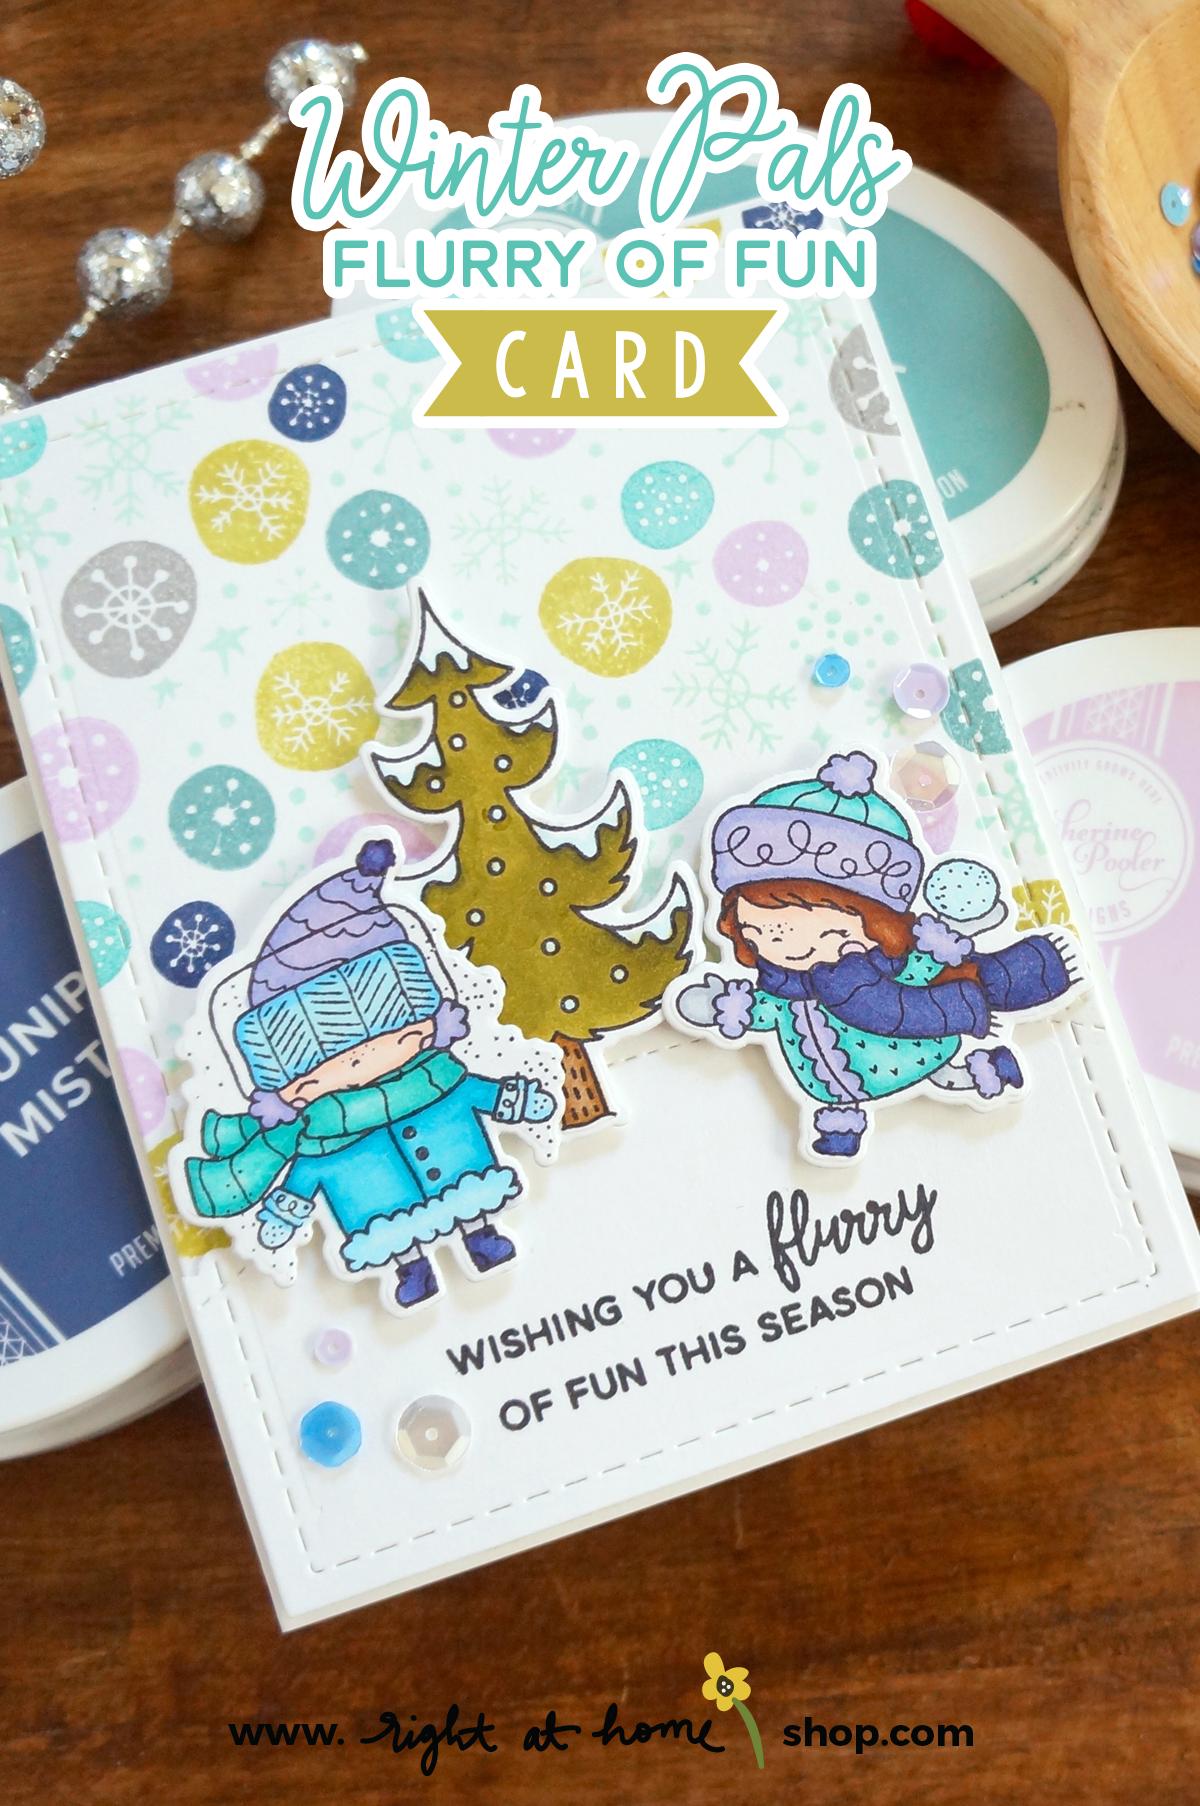 Winter Pals Flurry of Fun Card // rightathomeshop.com/blog